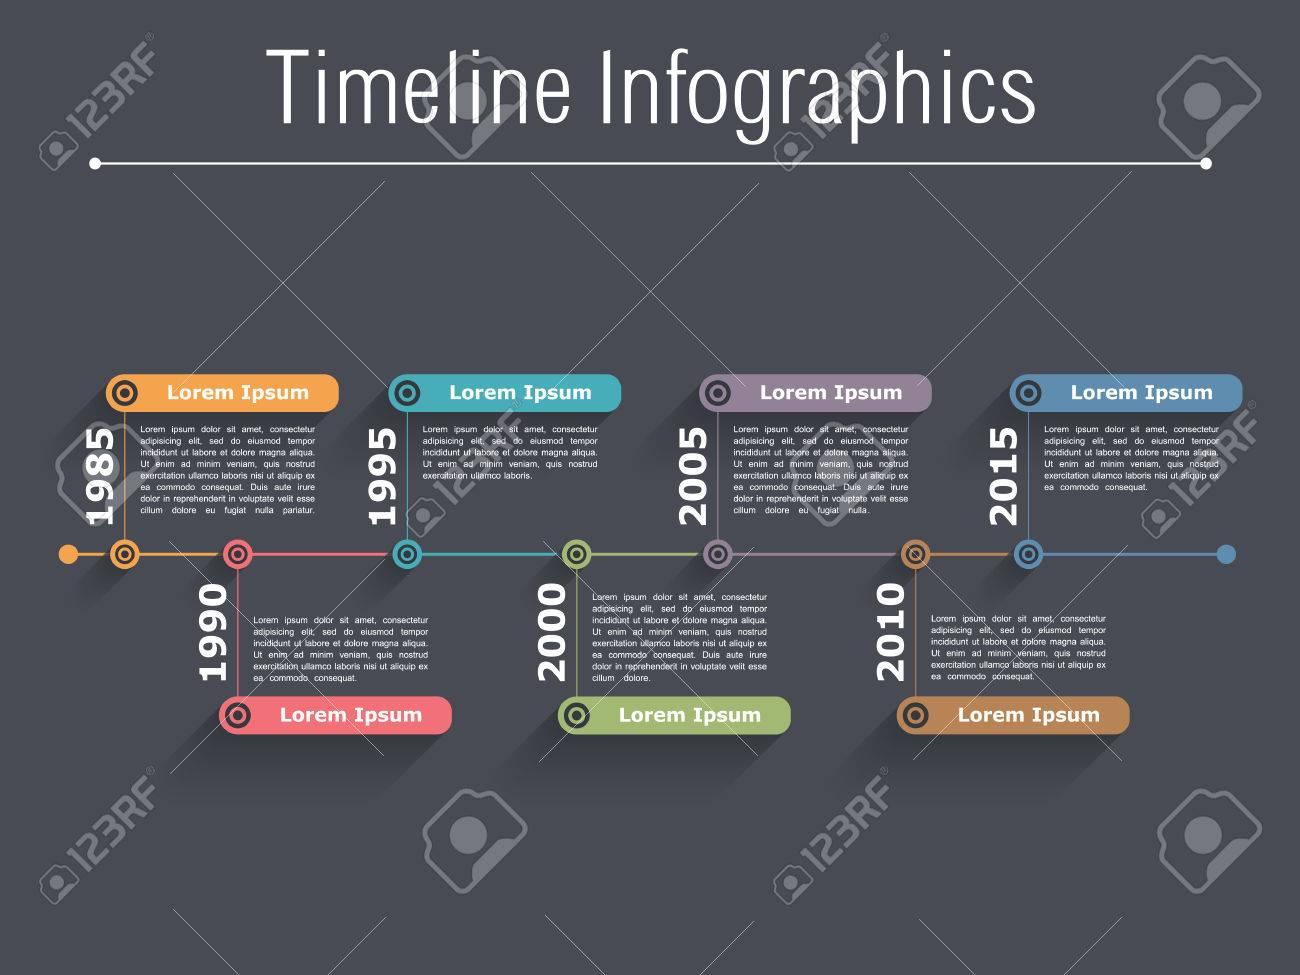 Timeline infographics design template dark background - 39707004